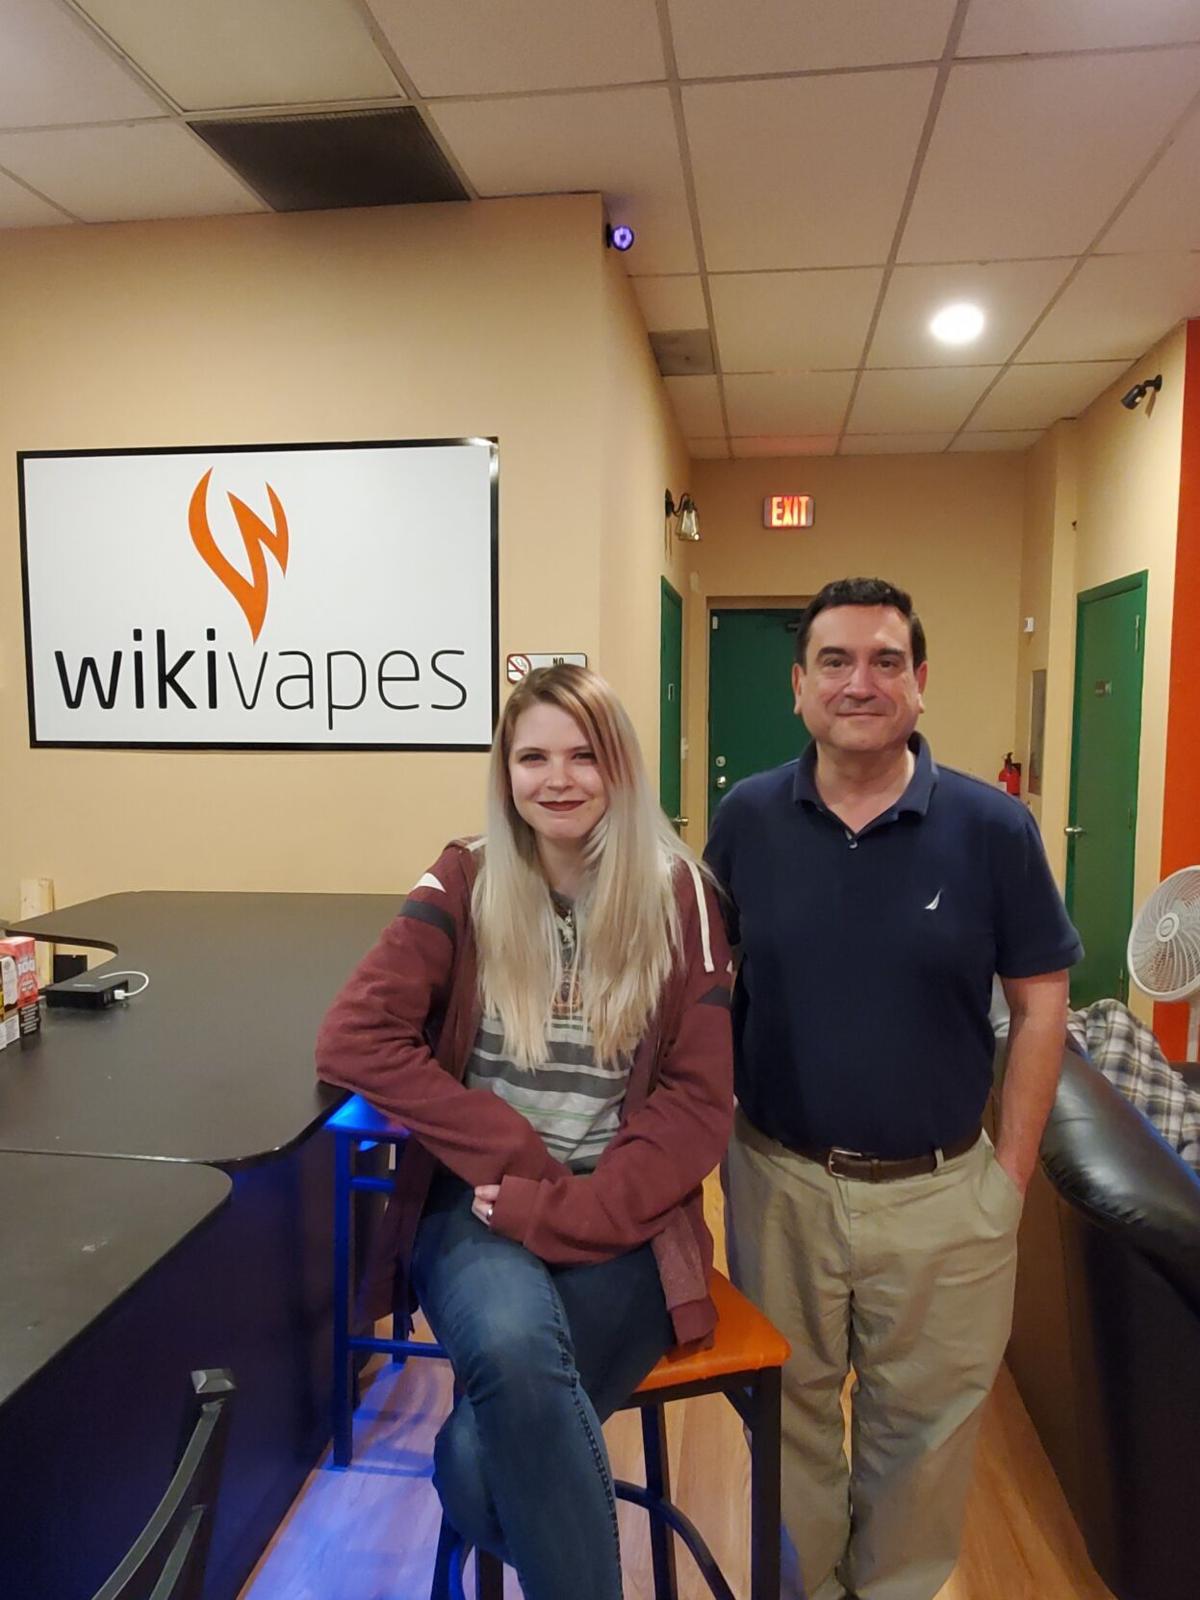 wikivapes